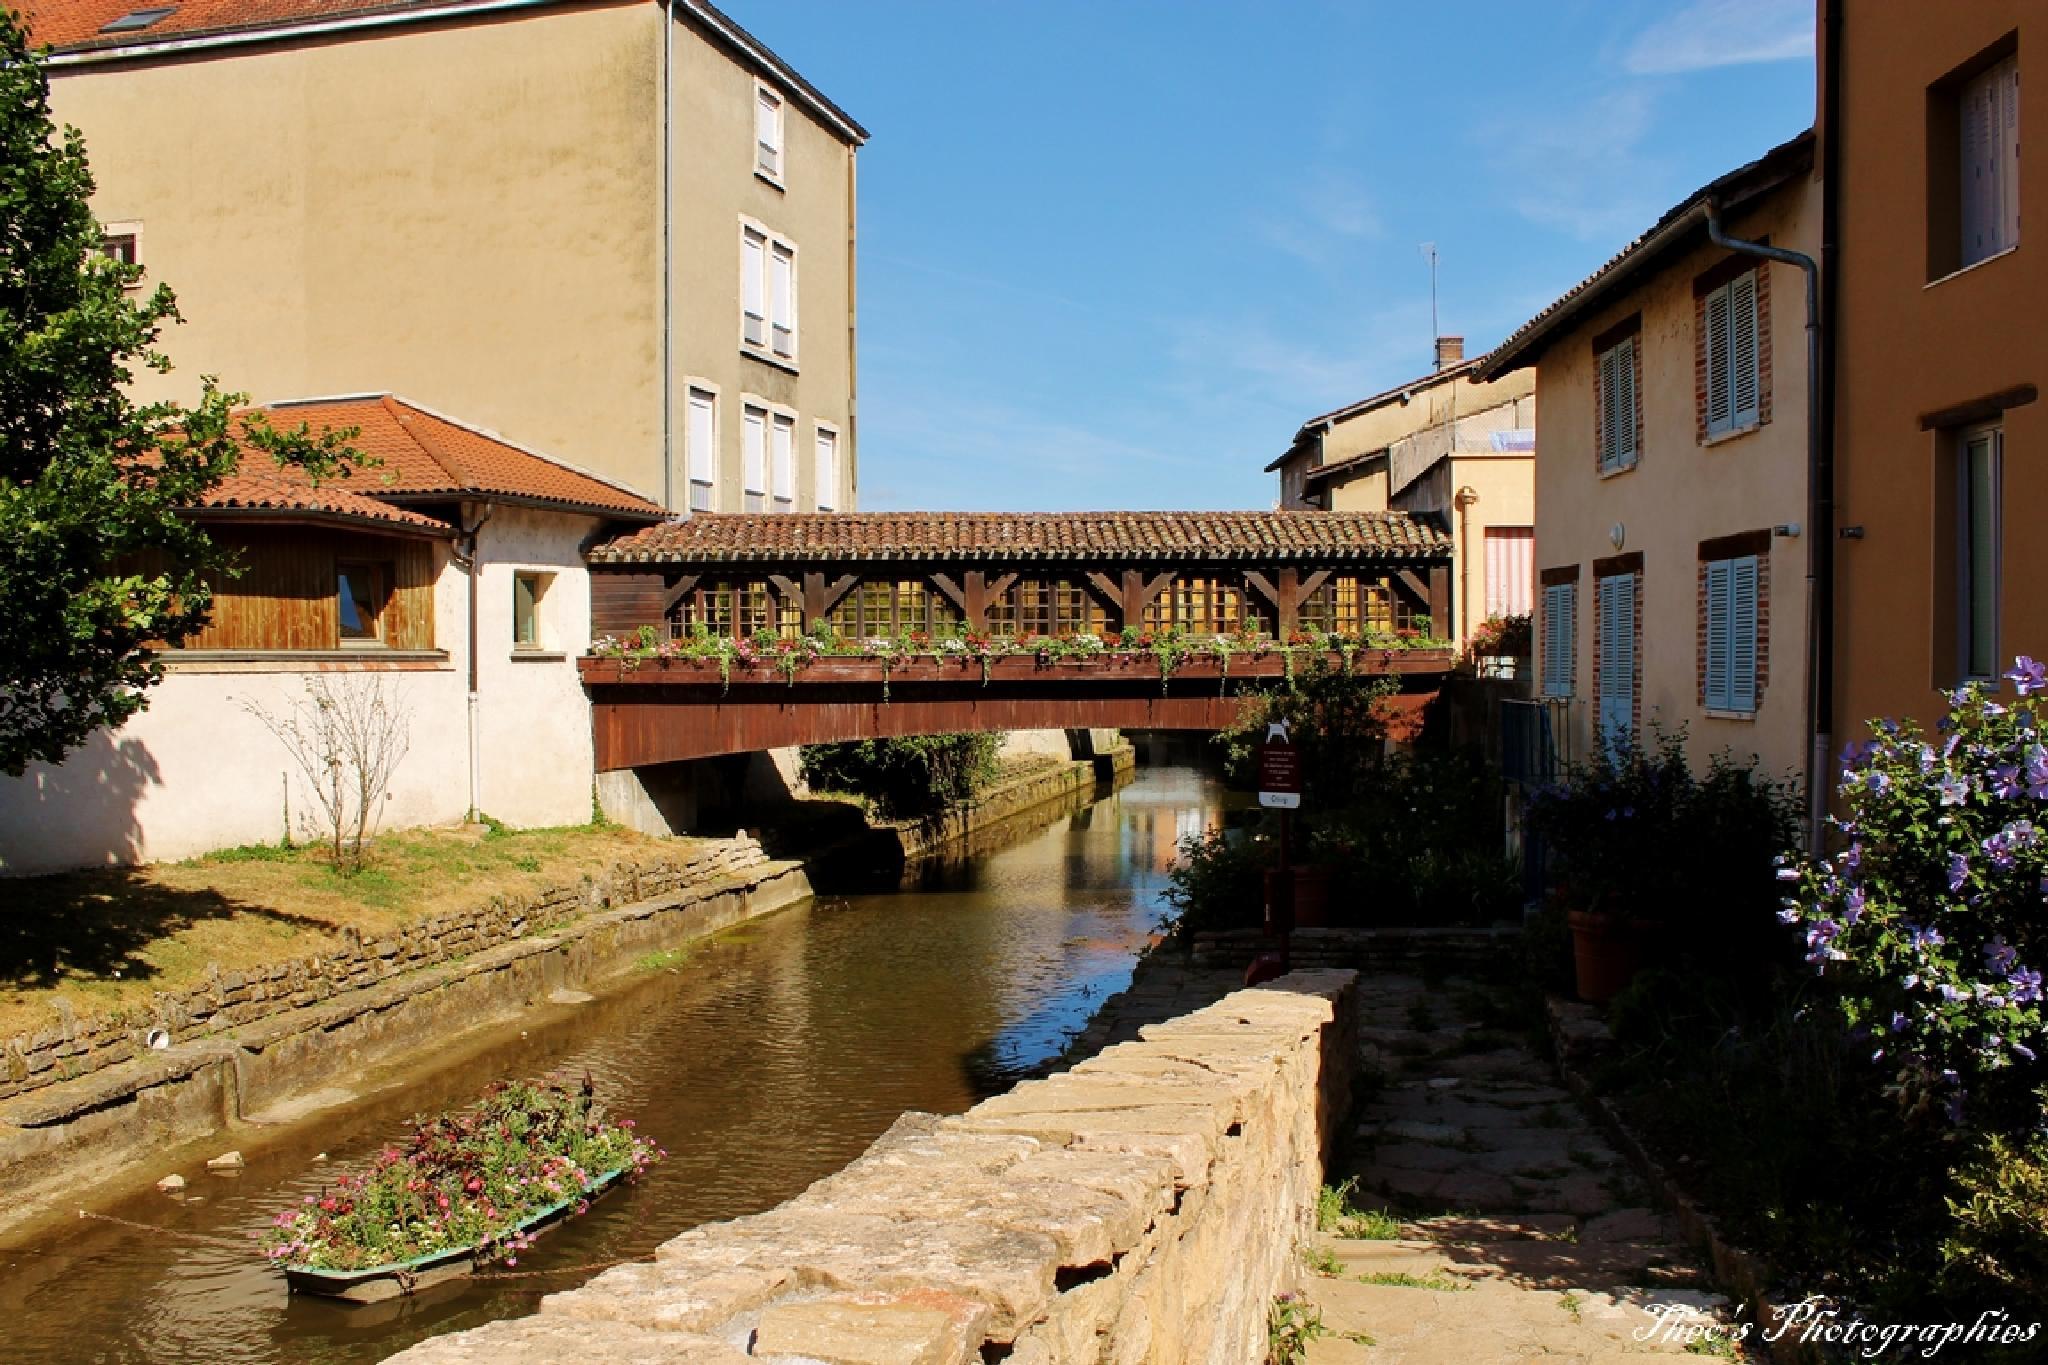 Chatillon sur Chalaronne ( 01 ) France by theocaramel54